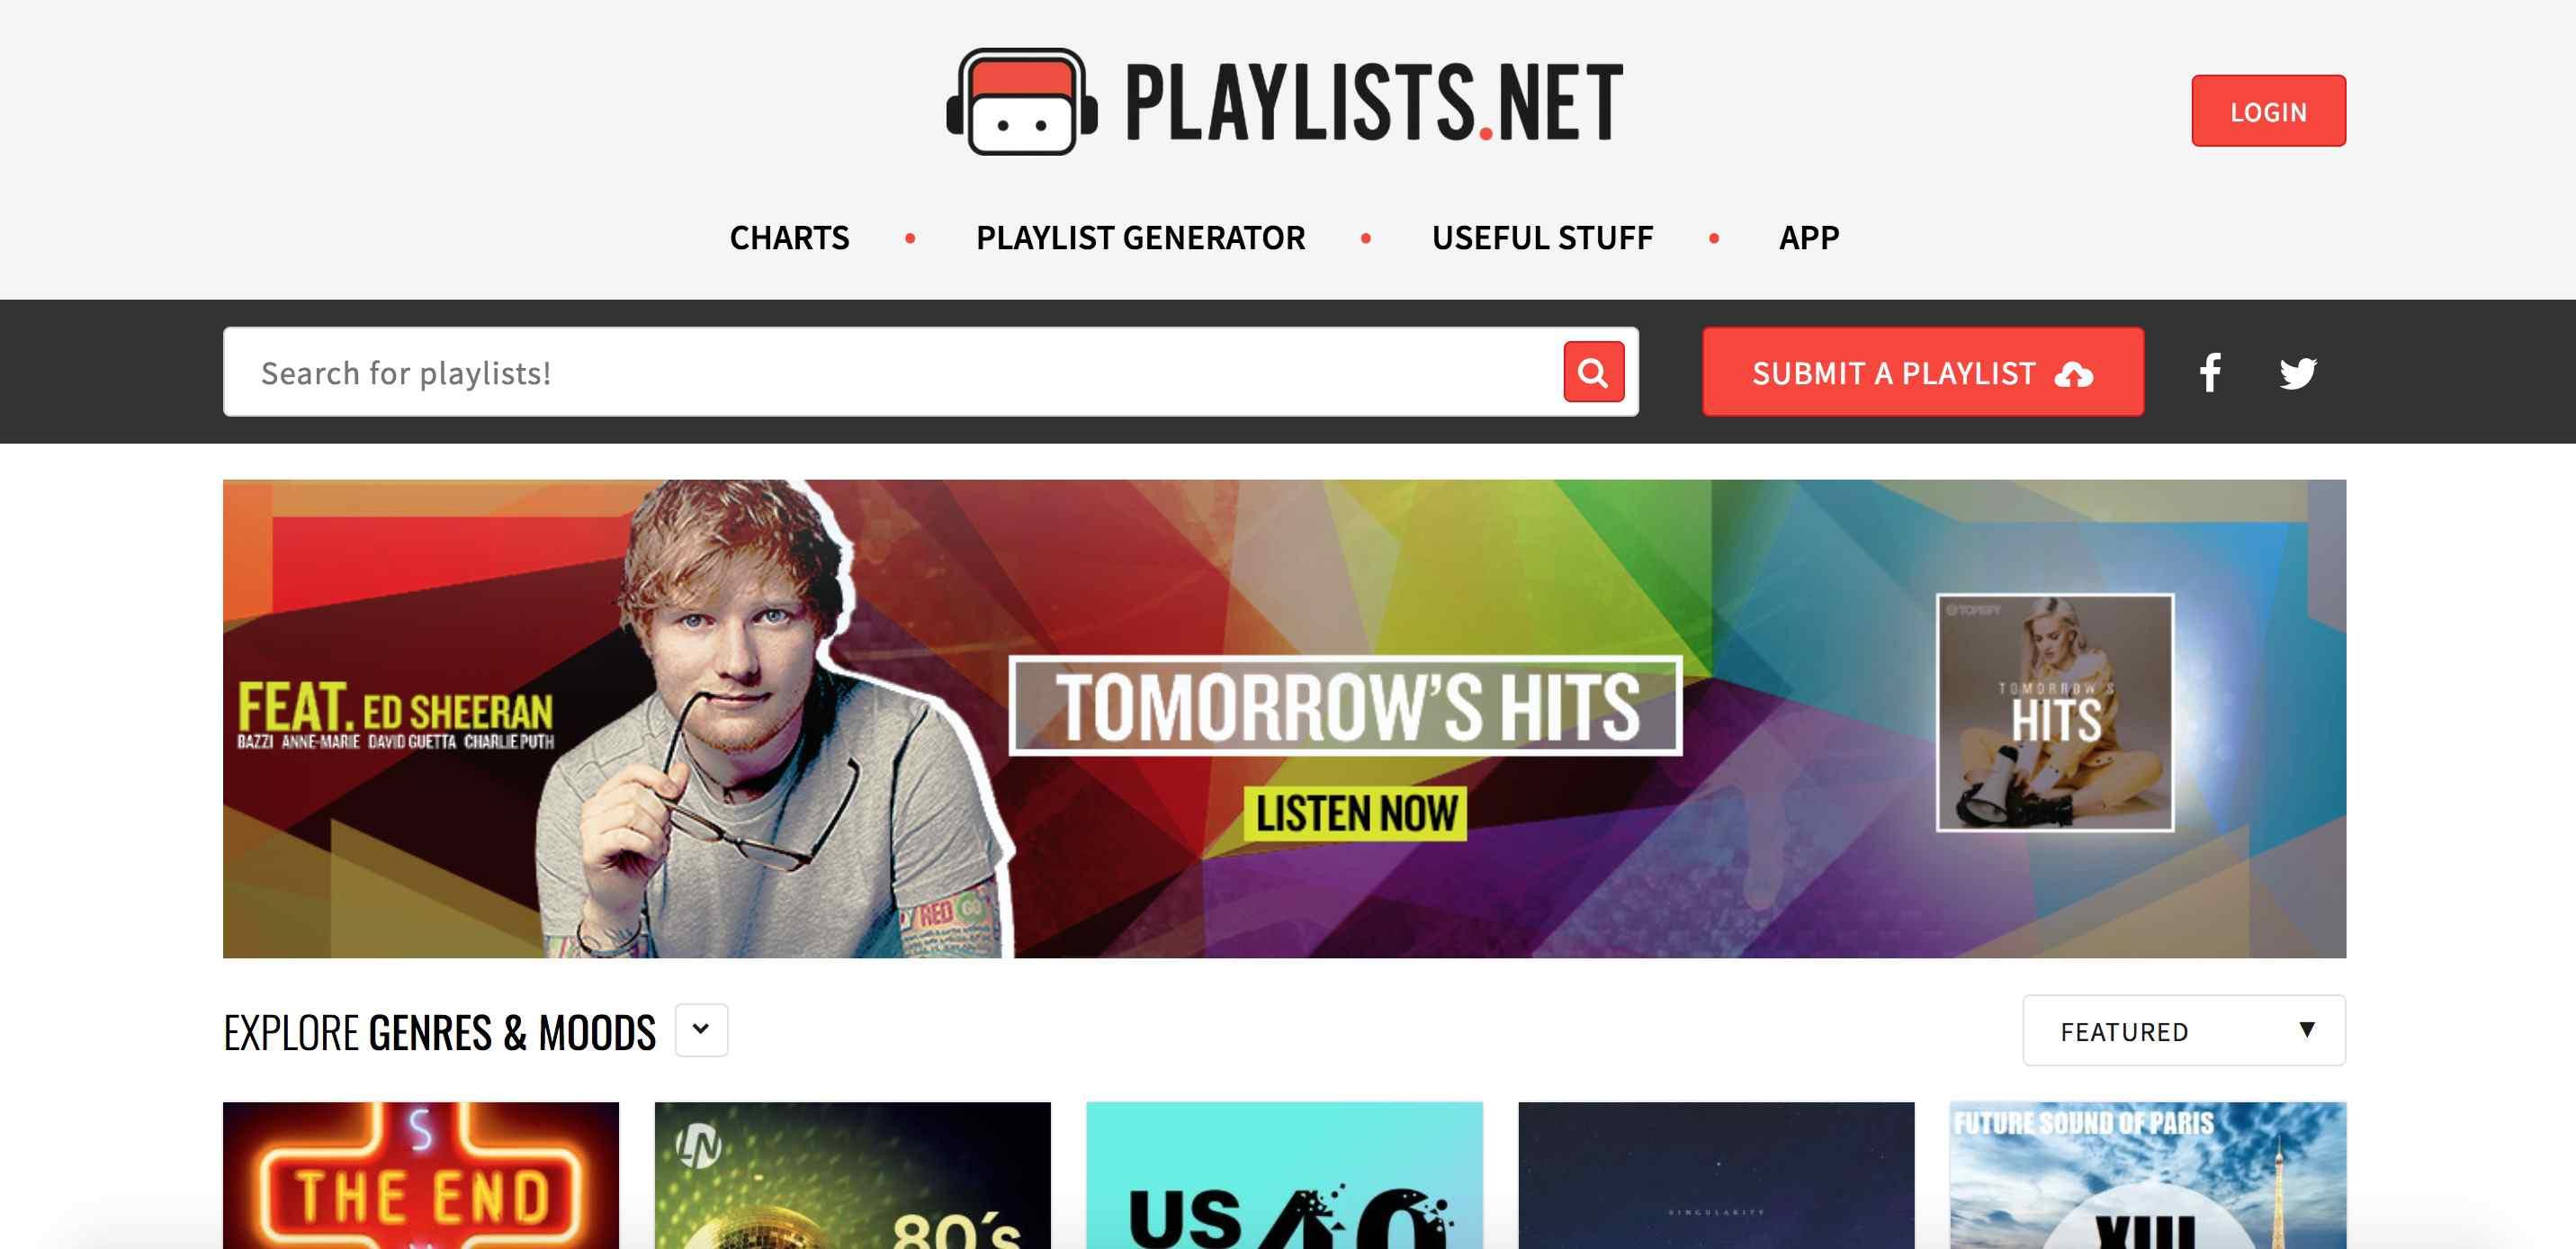 A screenshot of Playlists.net.